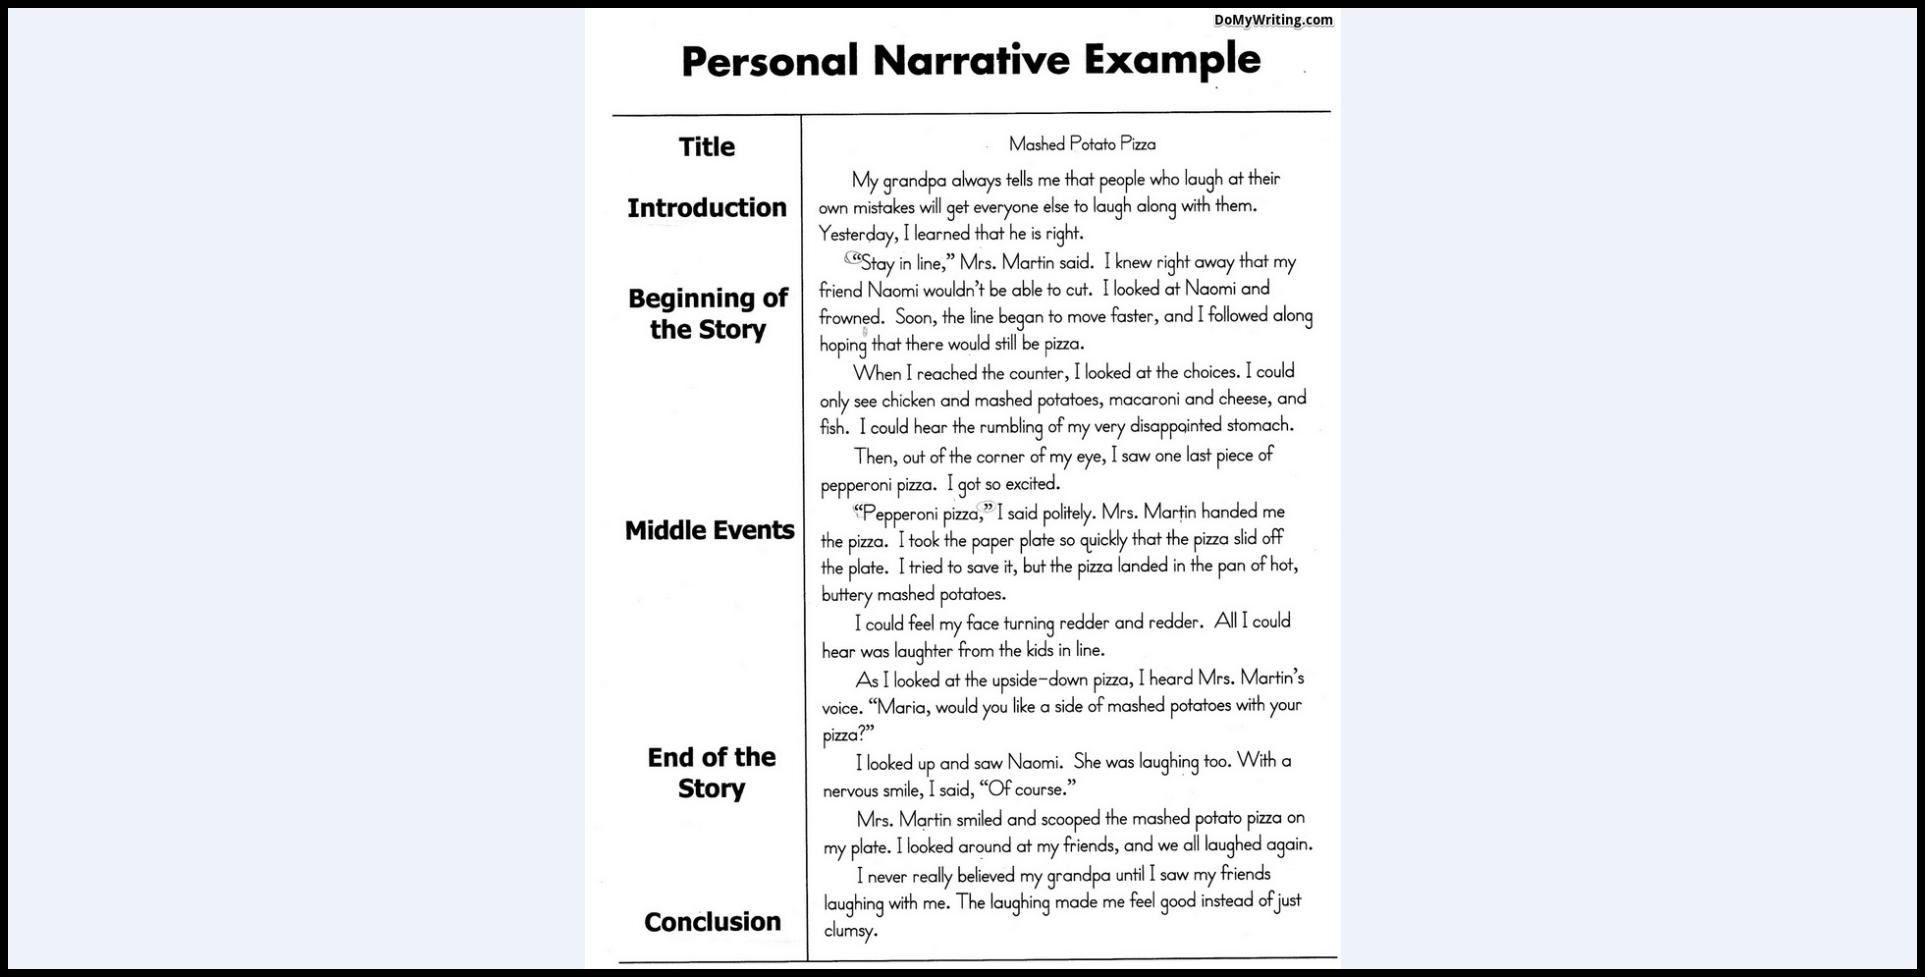 009 Essay Example Narrative Unforgettable Samples Examples High School Format Interesting Spm Full